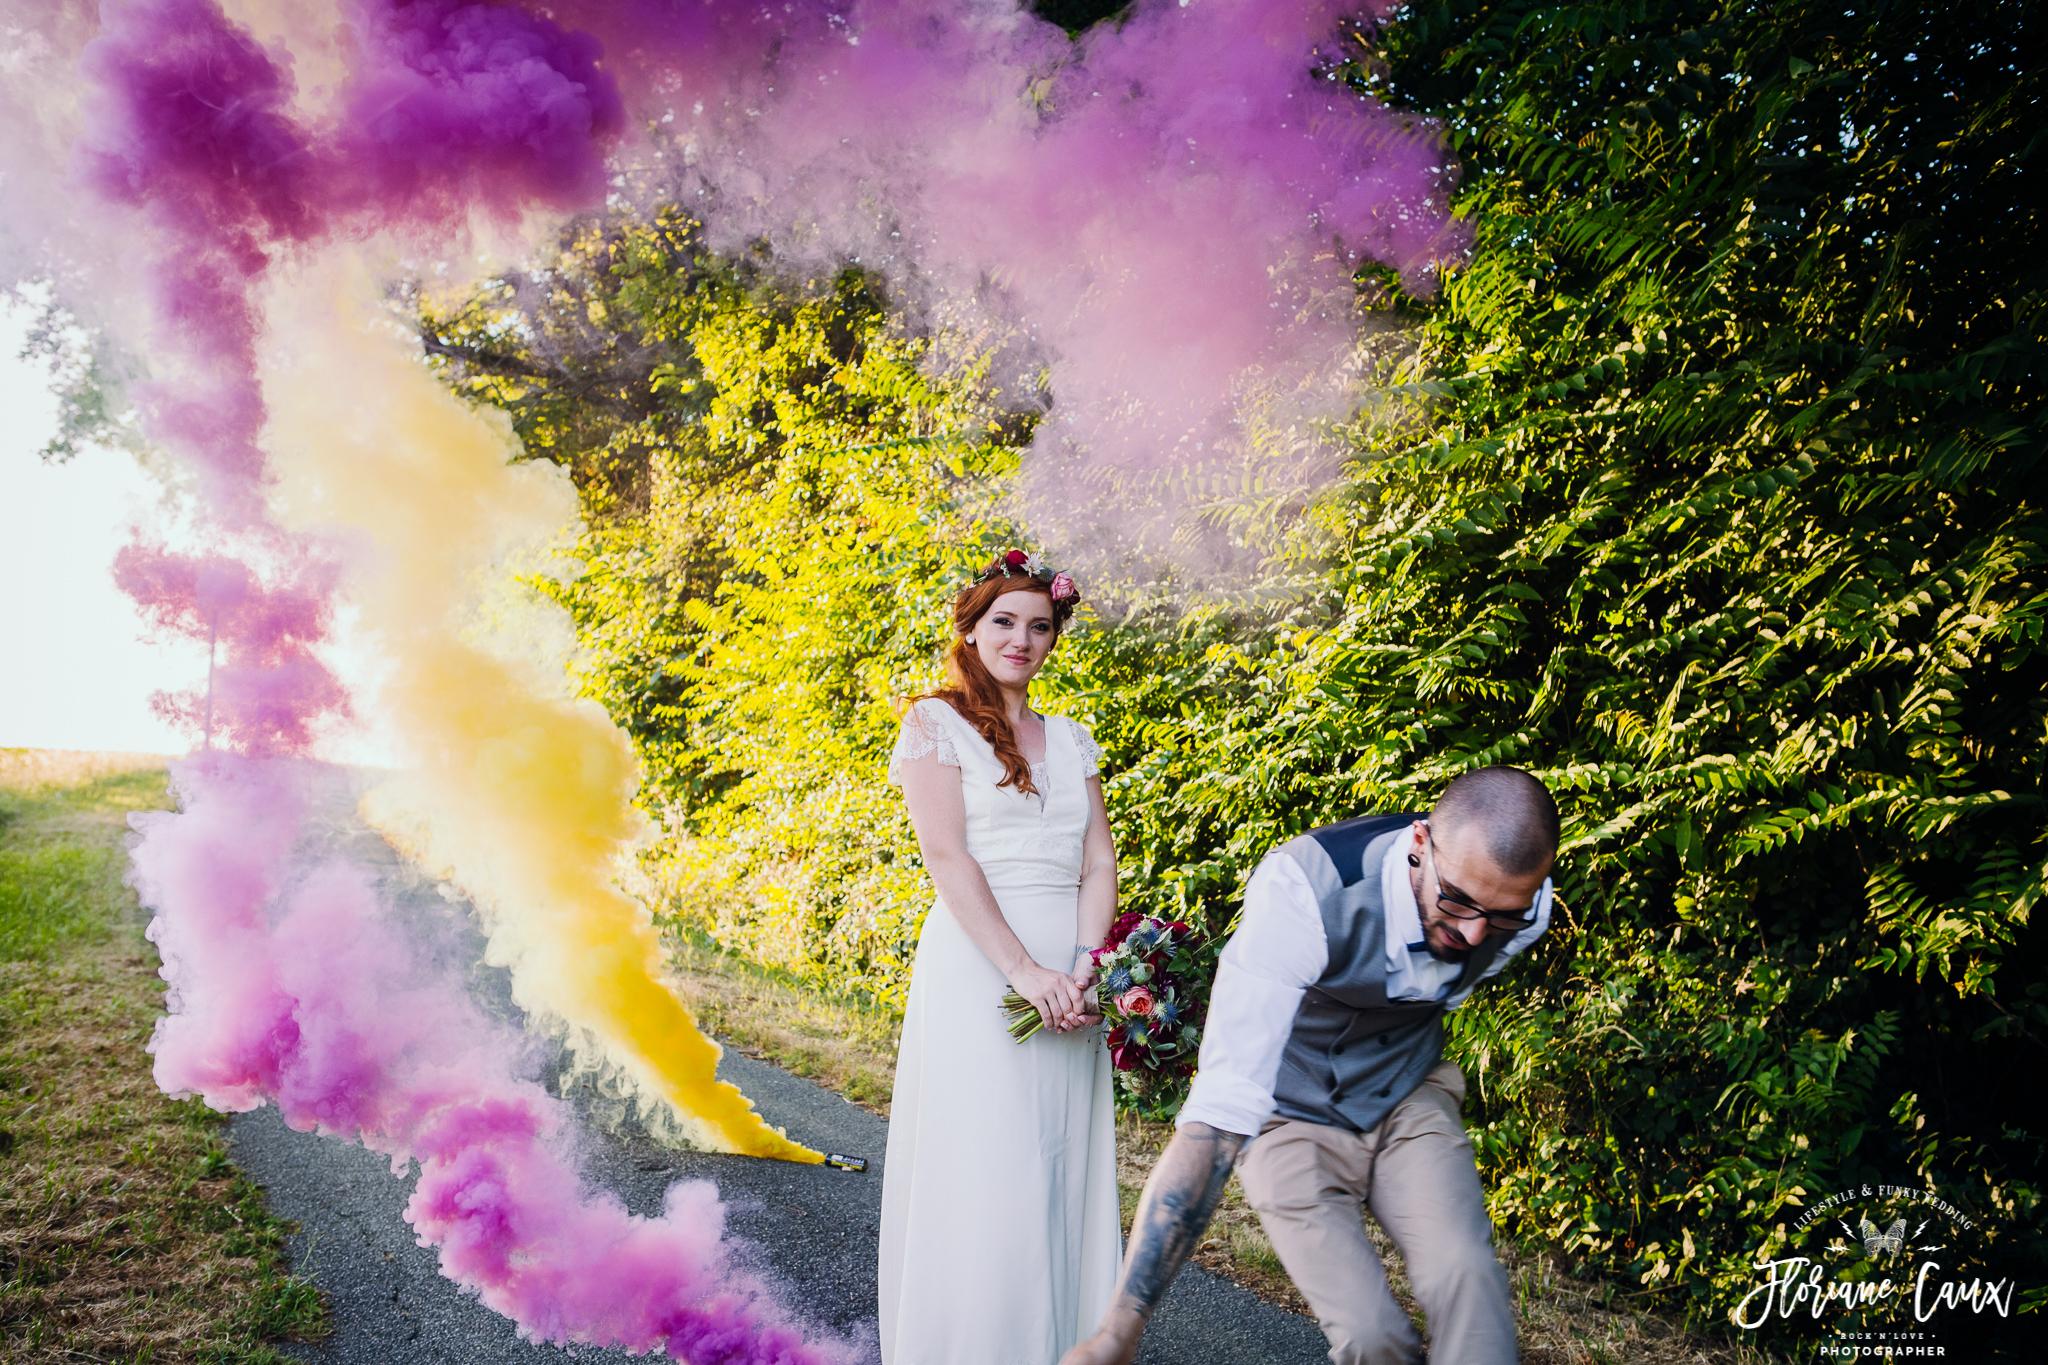 photographe-mariage-toulouse-rocknroll-maries-tatoues-floriane-caux-64